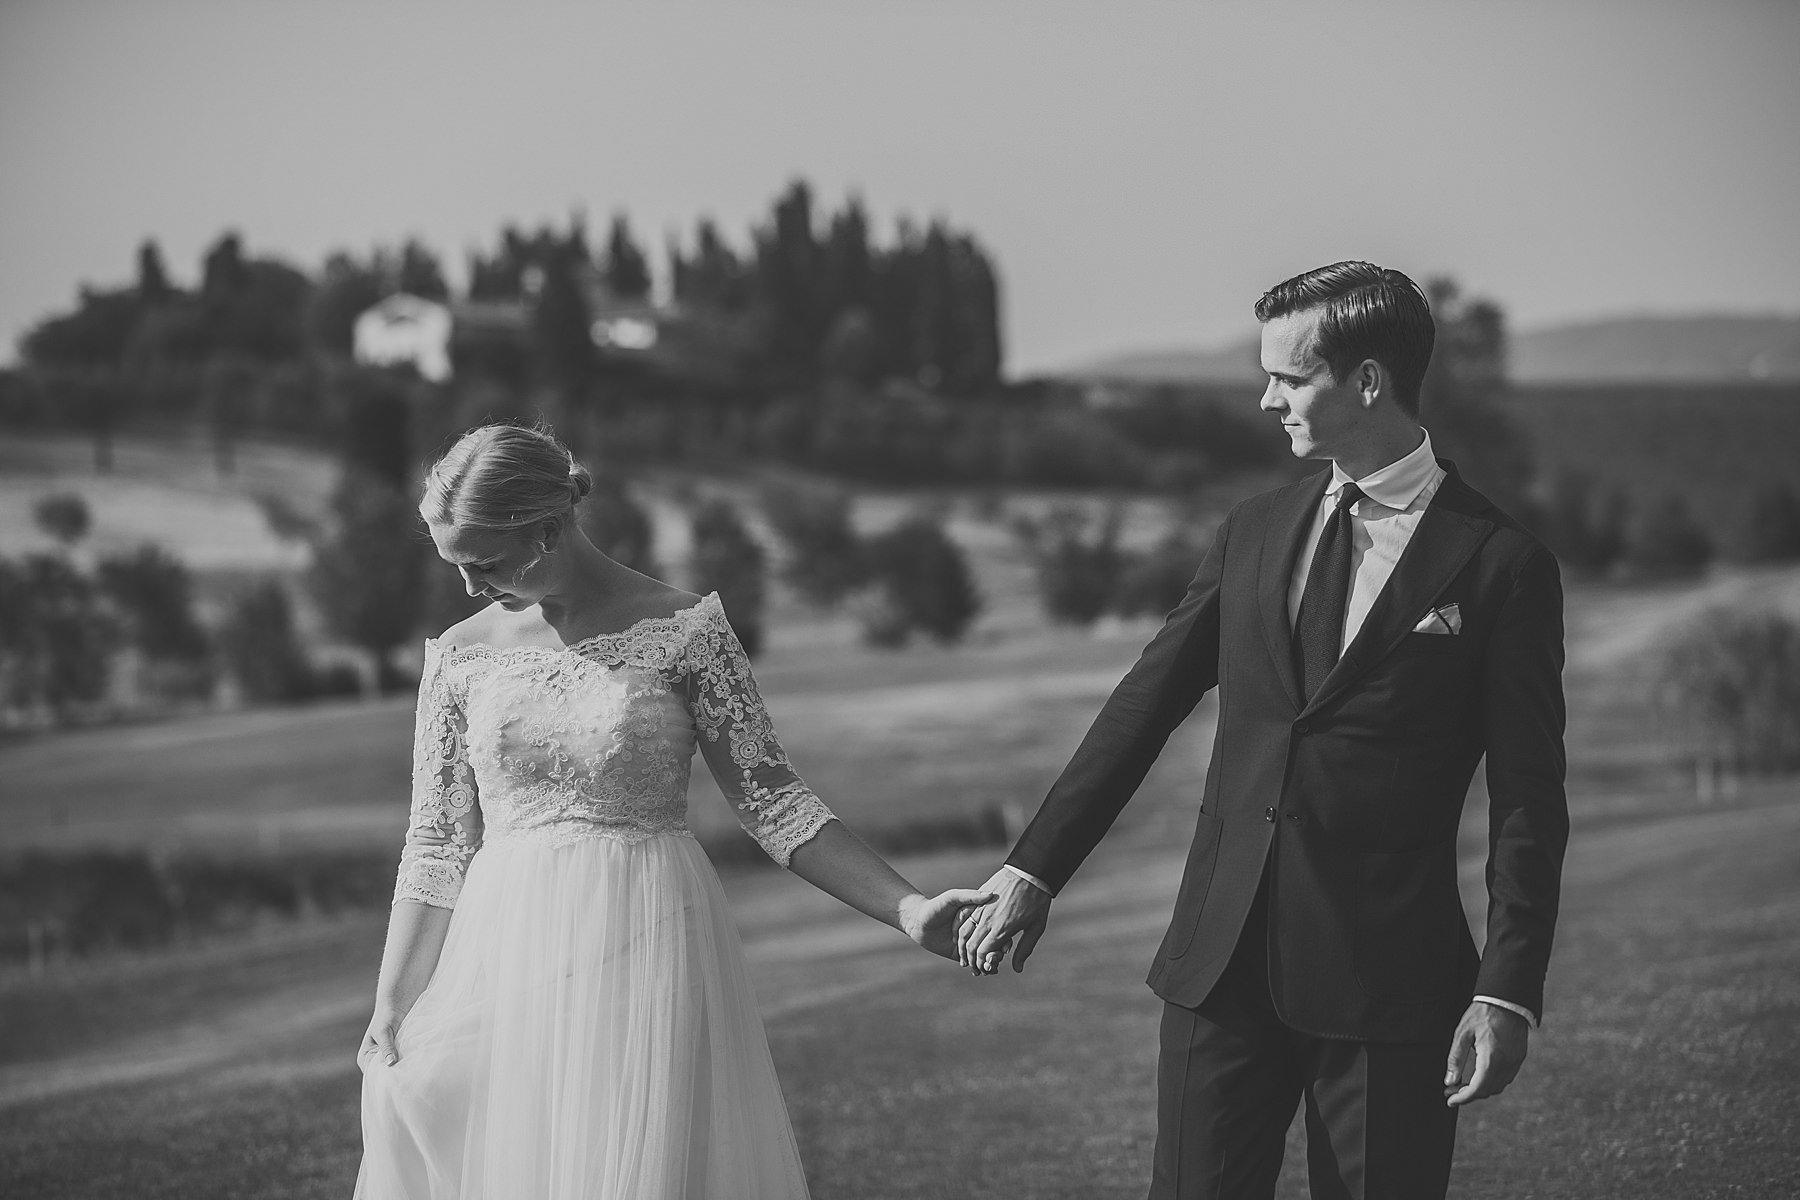 matrimonio intimo a bellosguardo vinci 026